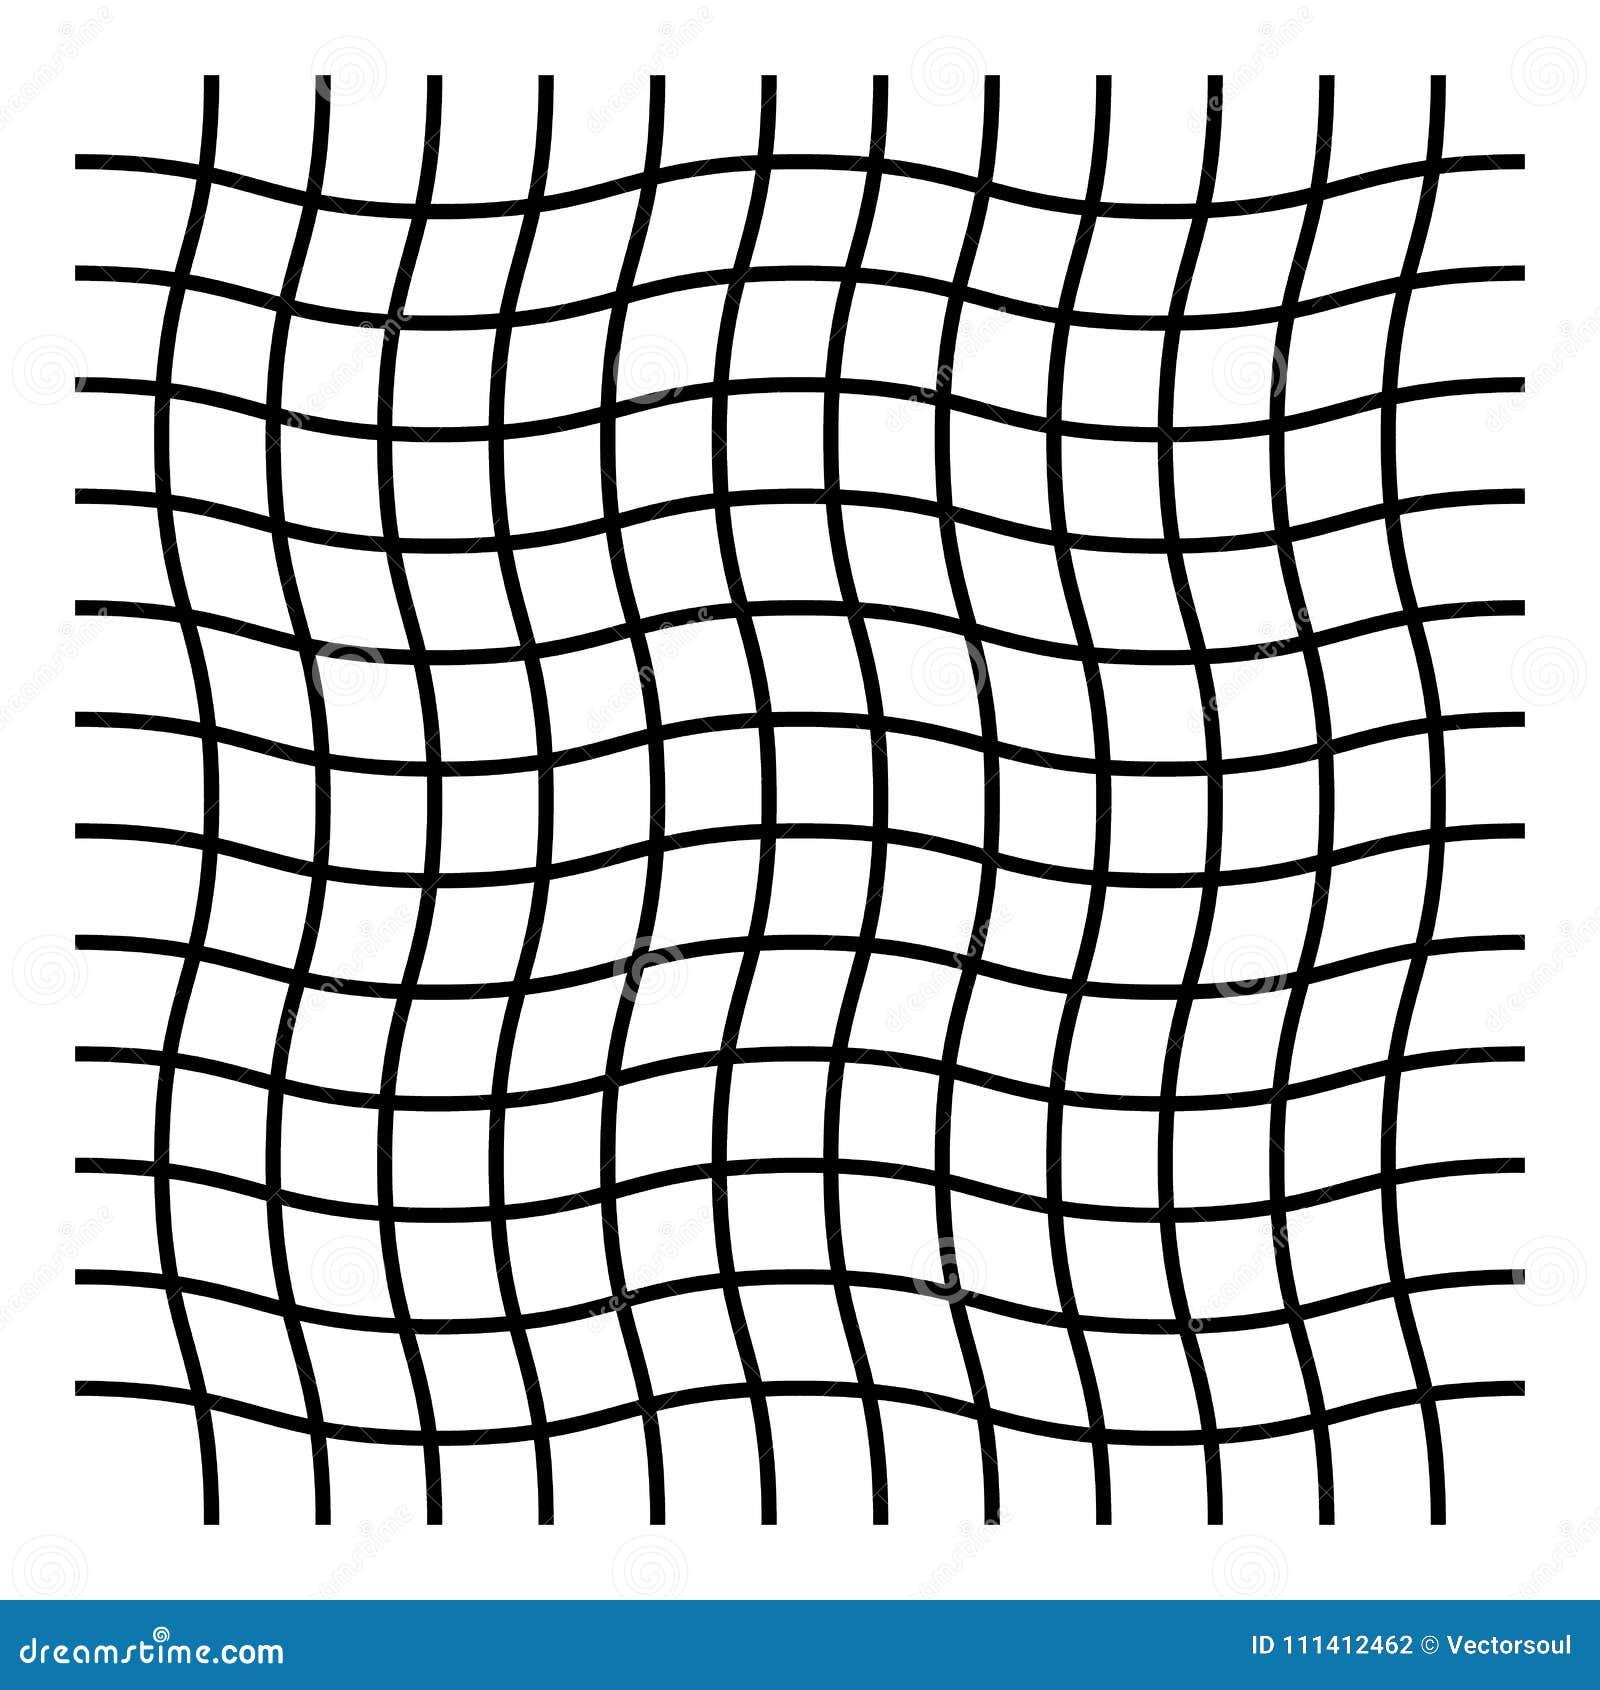 Wavy, Zig Zag, Criss Cross Grid Pattern Stock Vector - Illustration